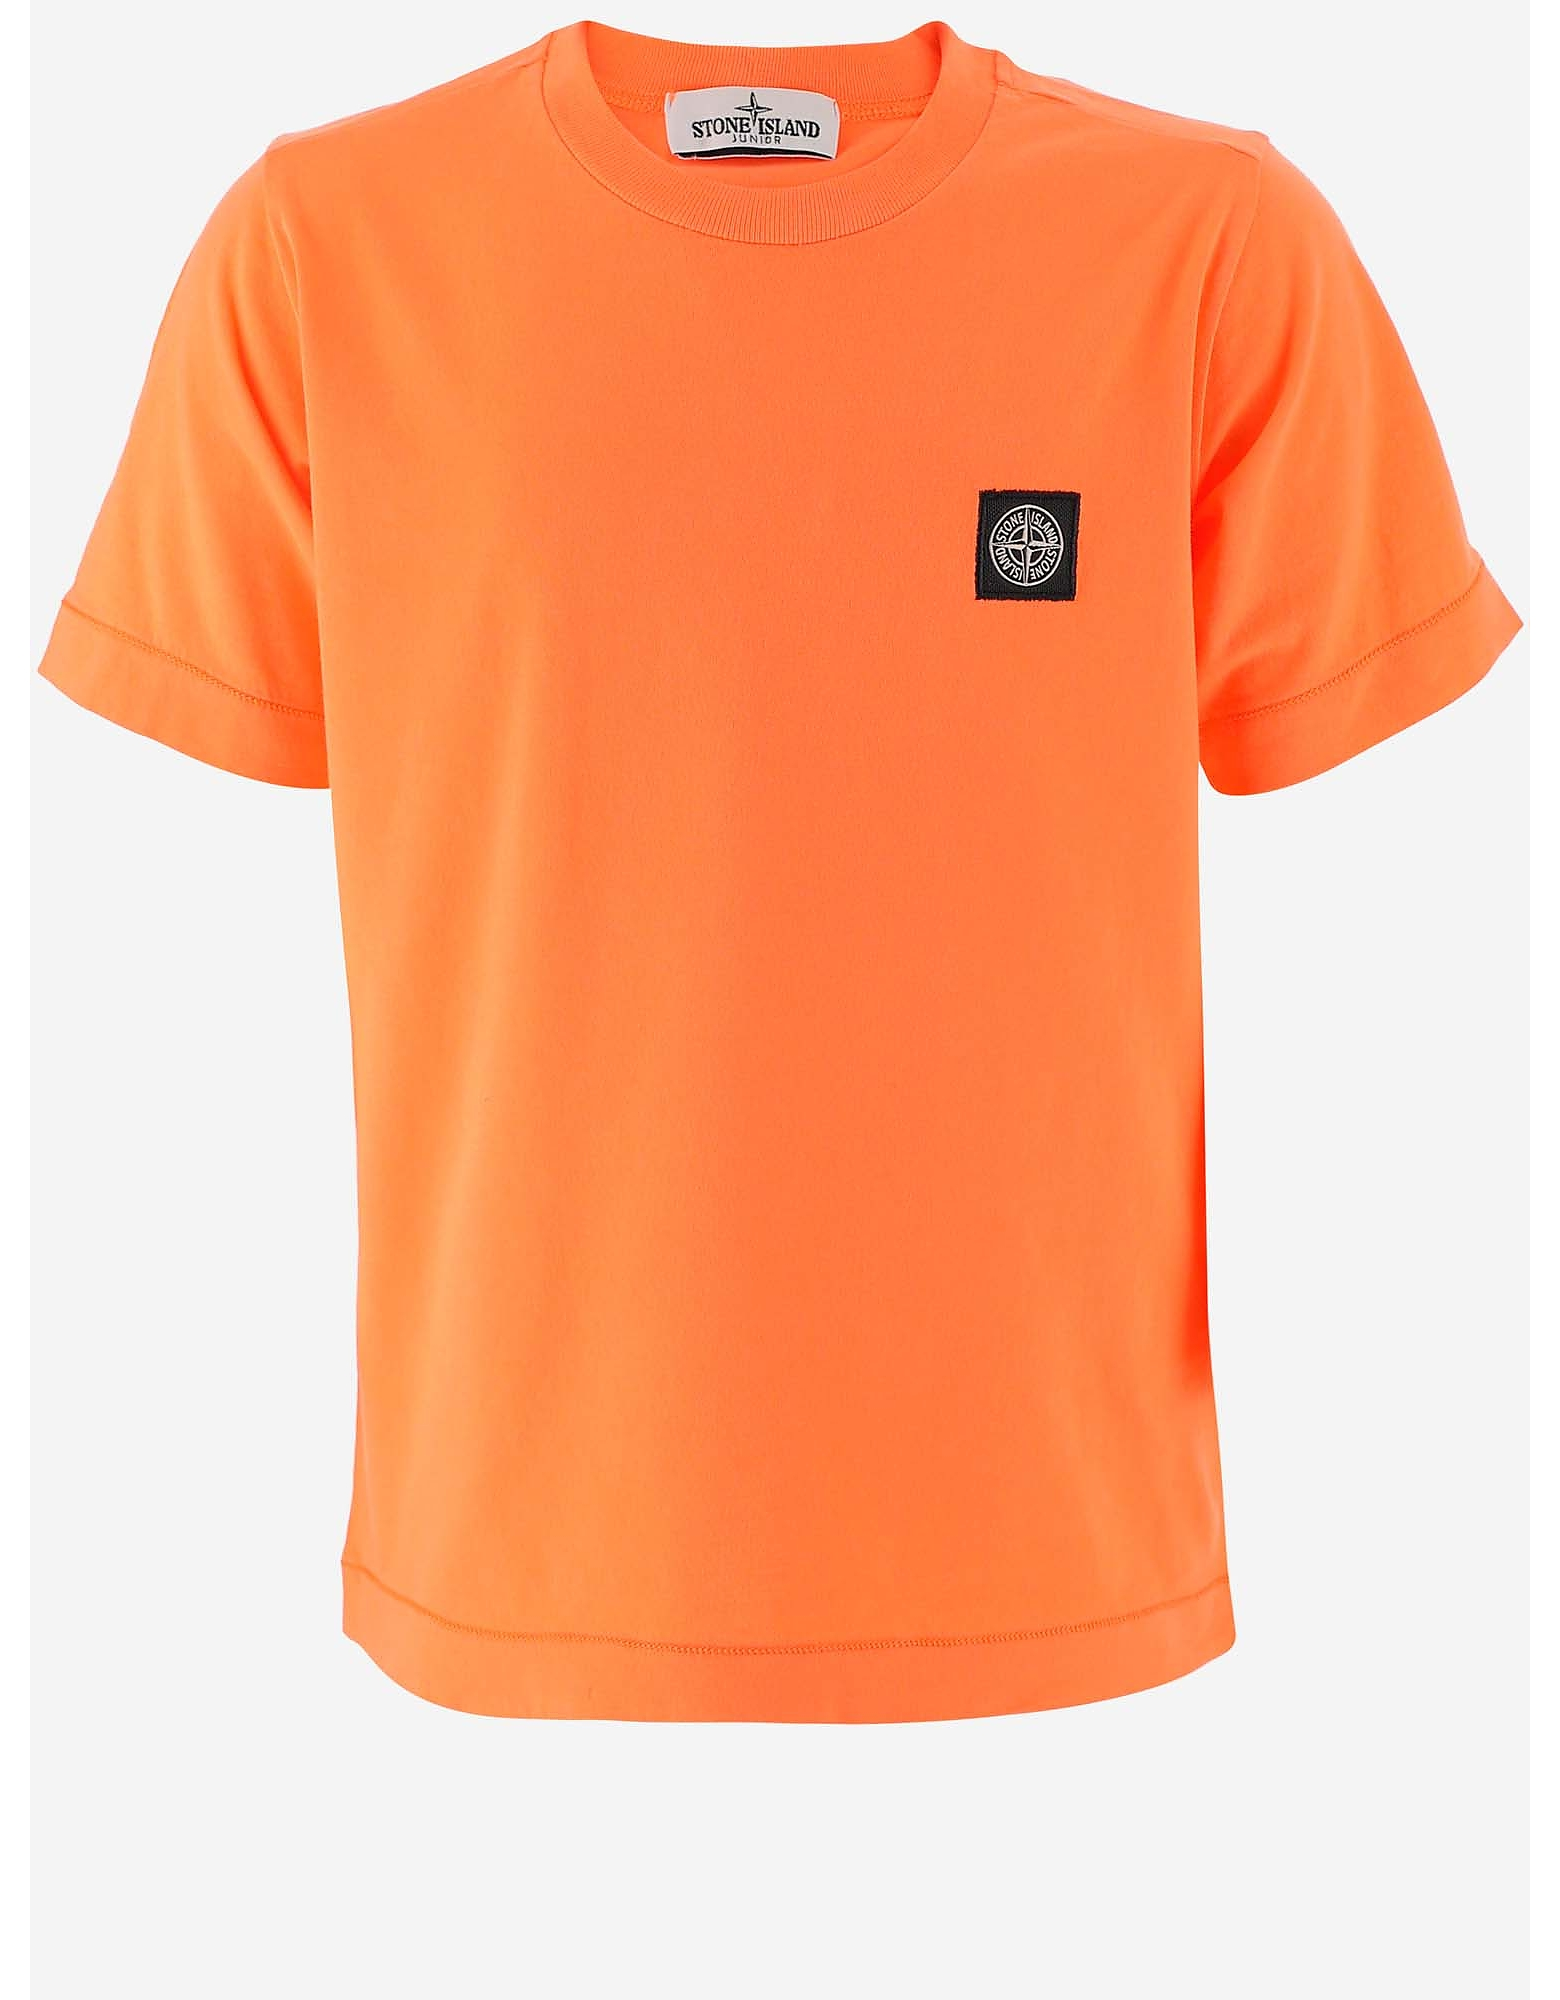 Stone Island Designer Boy's Clothing, Mandarin Pure Cotton Boy's T-Shirt